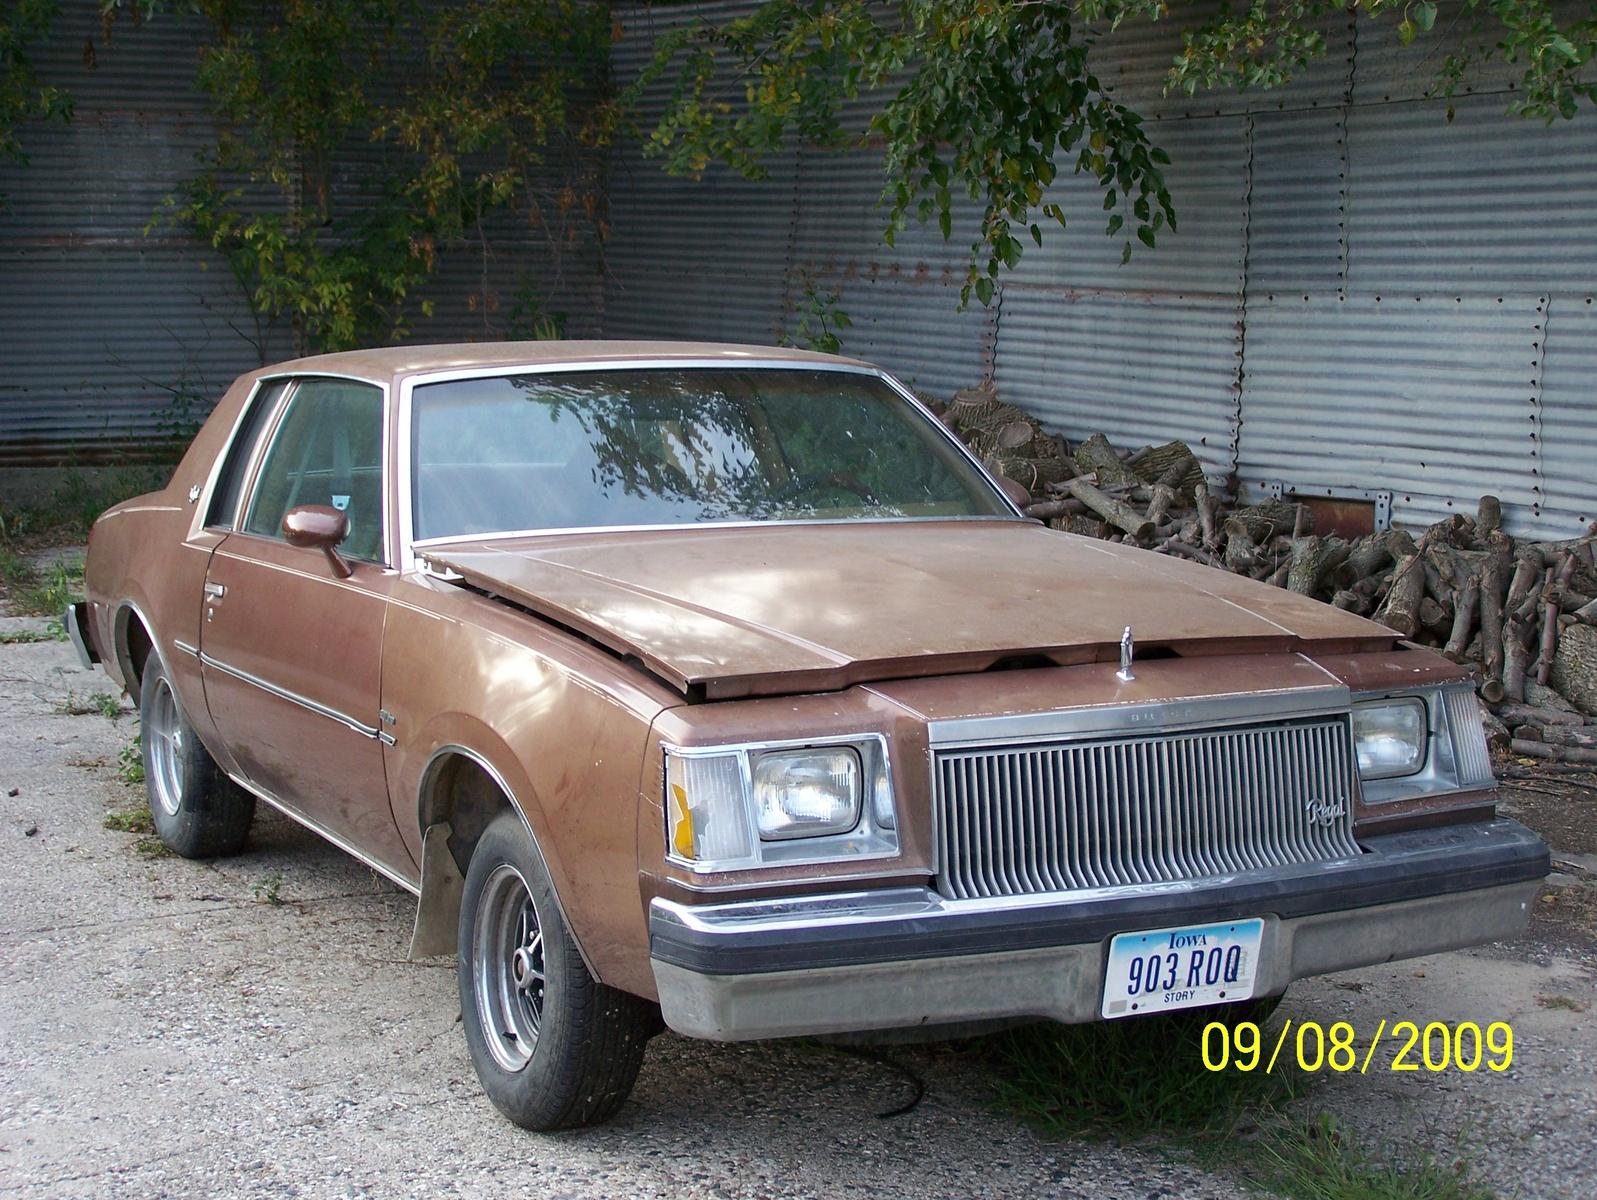 Picture of 1978 buick regal 2 door coupe exterior